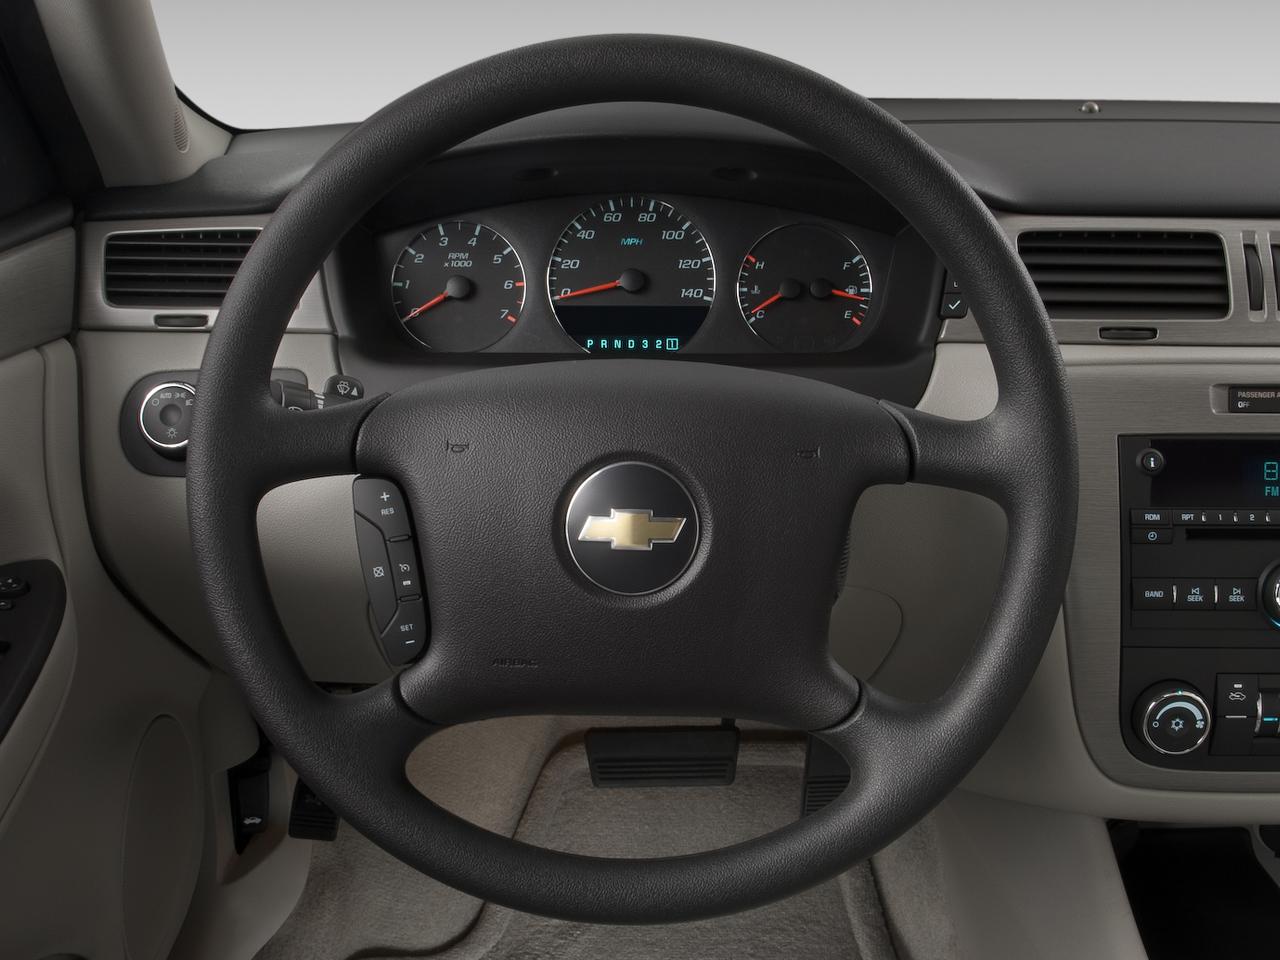 2010 chevy impala shifter parts diagram  diagram  auto